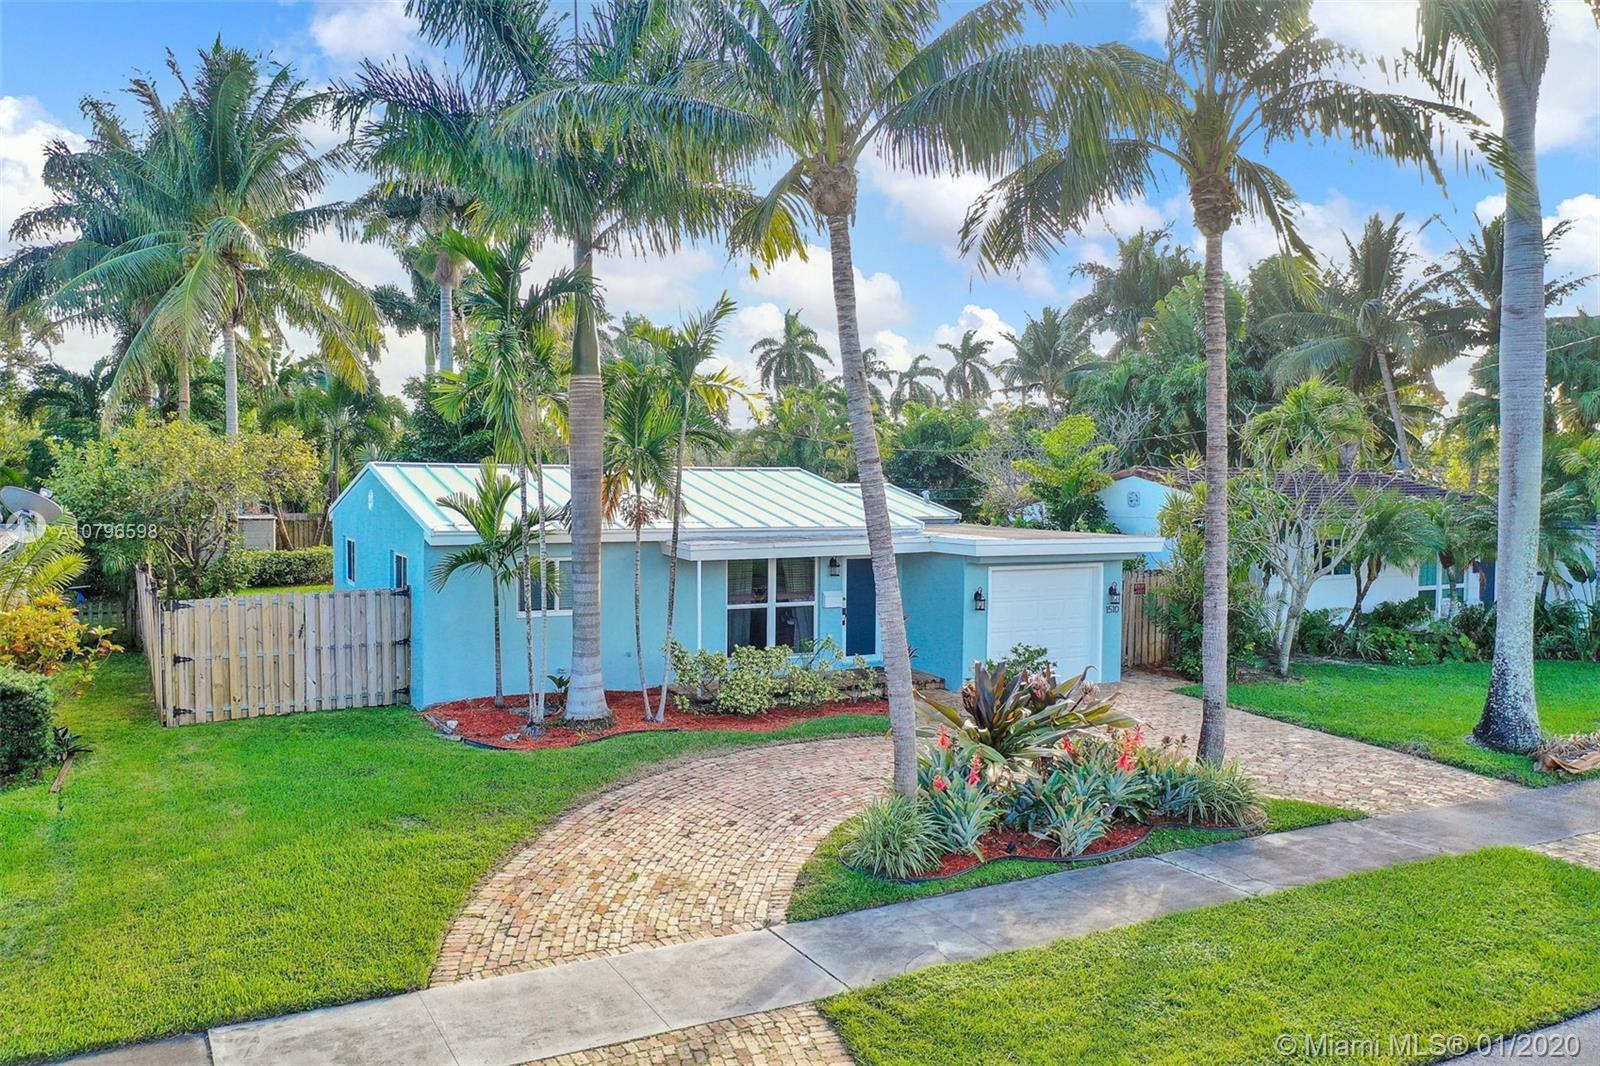 Enchanting 3/2 + Florida room home on large fenced lot. Loads of charm, impact windows & doors, meta